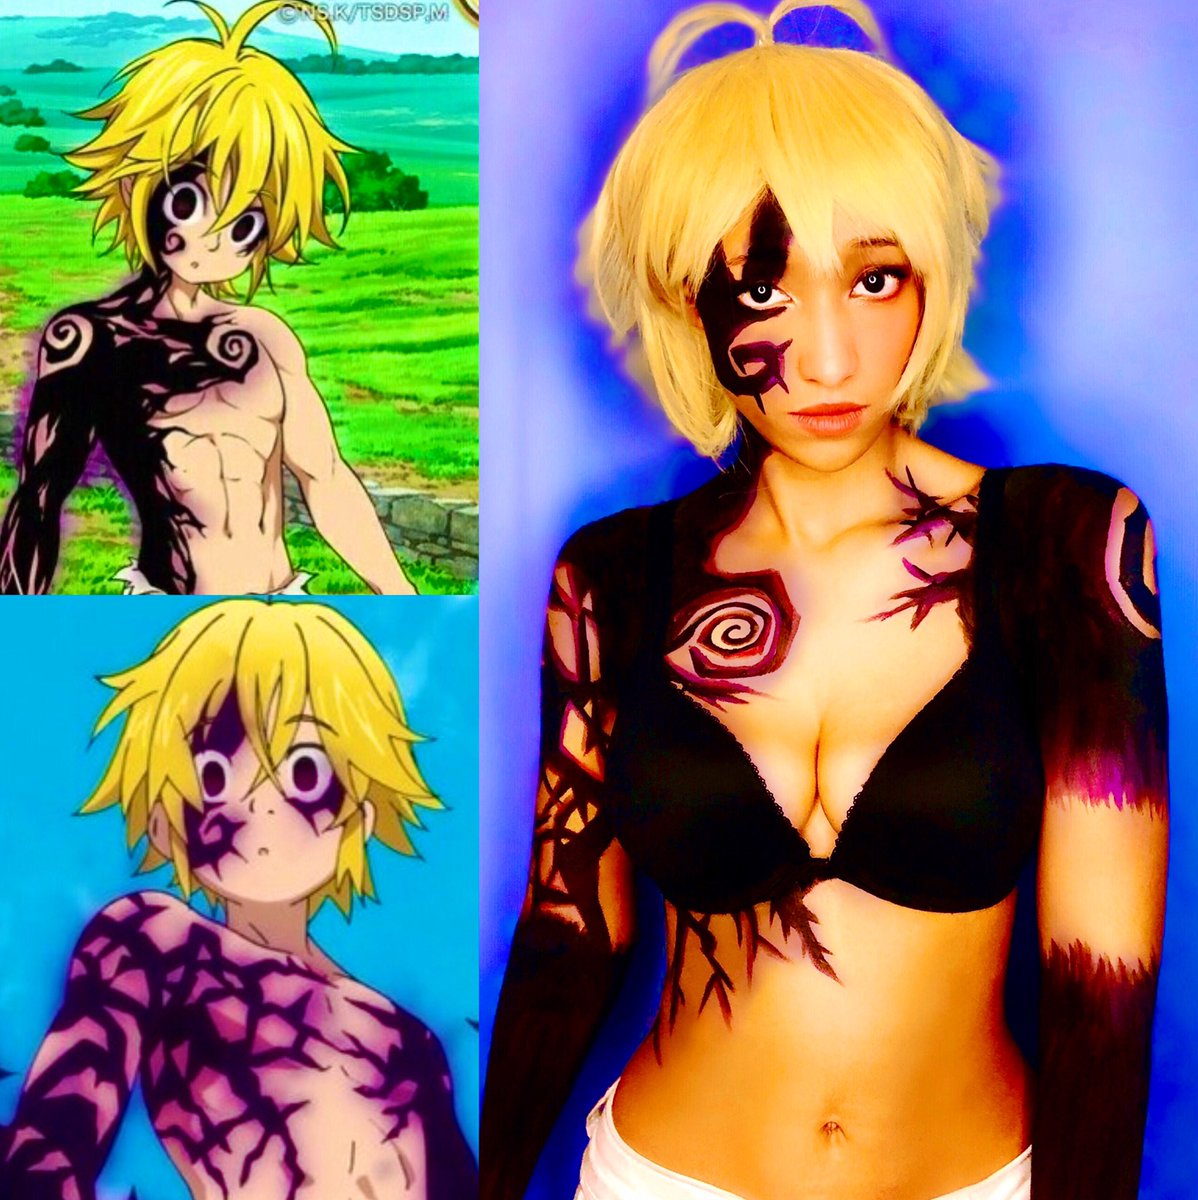 Meliodas  My inspired look of Meliodas' demon form marks  More at http://Onlyfans.com/Leiracosplays   Bodypaint from @mehronmakeup  #SevenDeadlySins #NanatsunoTaizai #Meliodas #Meliodascosplay #cosplay #cosplayer #blackcosplayer #latina #anime #manga #blackcosplayerhere #makeuppic.twitter.com/fdM8fsNSX4